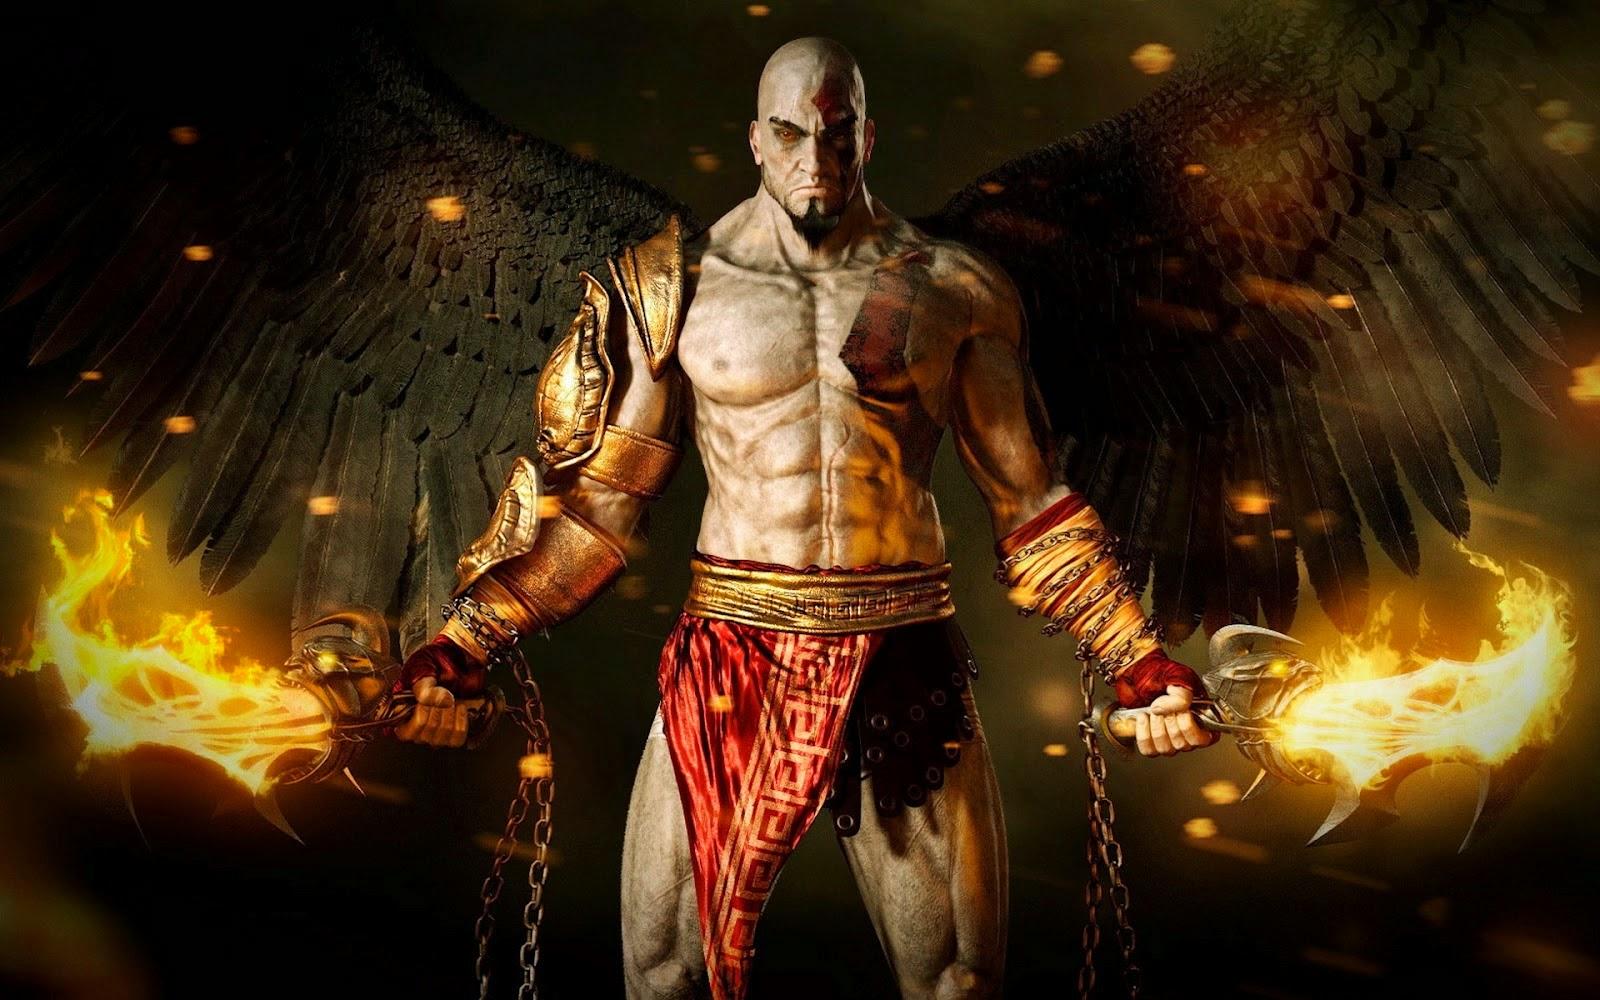 God of War HD Wallpaper